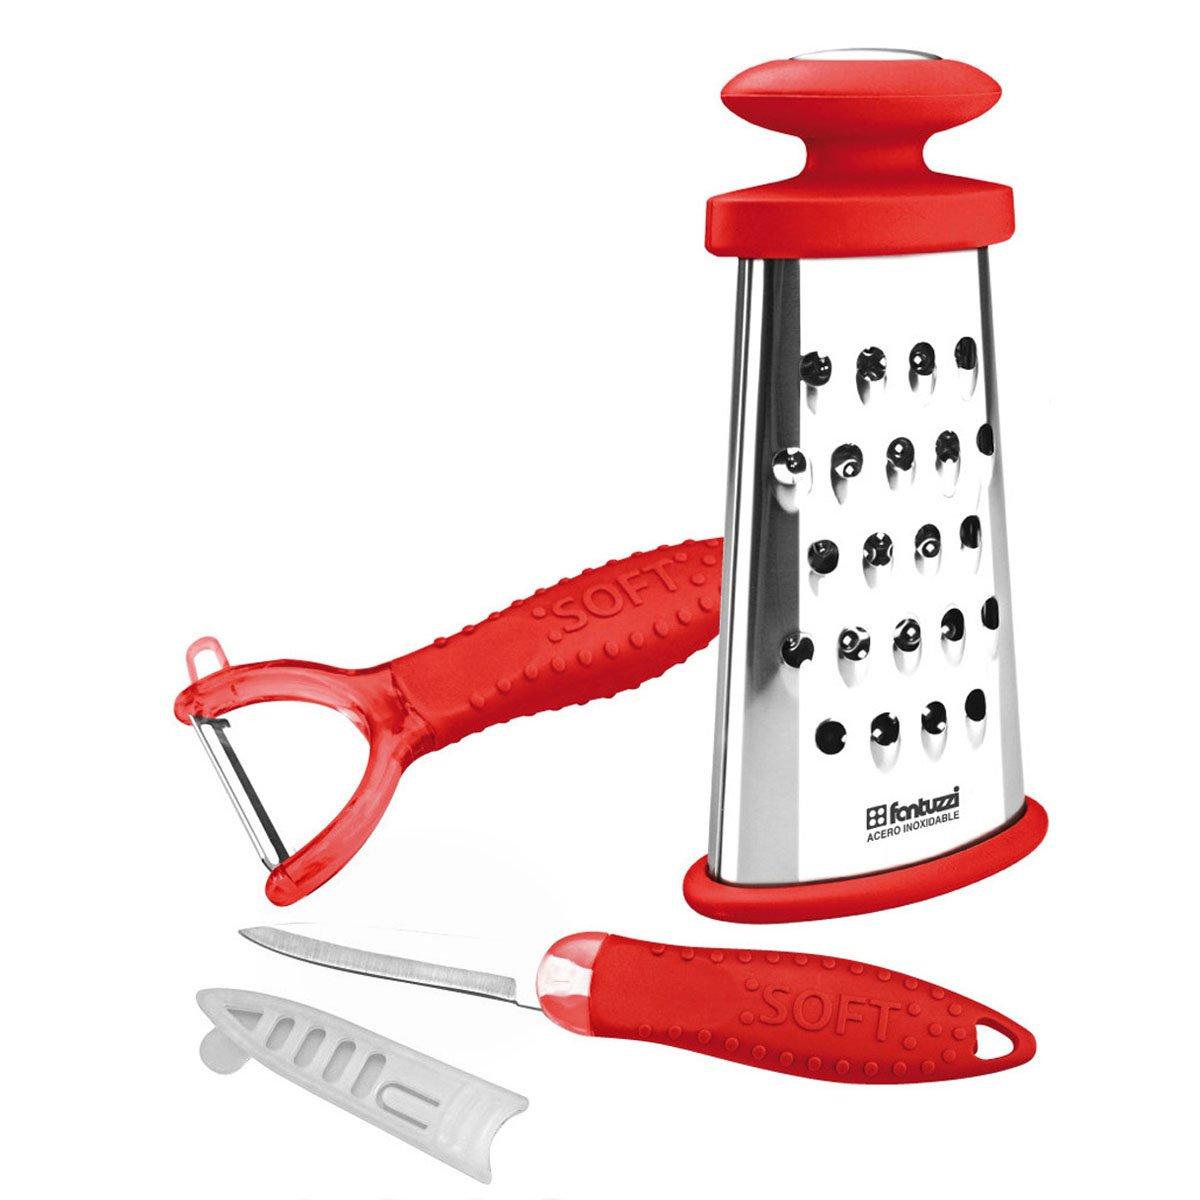 Juego de utensilios fantuzzi rojo sears com mx me for Juego de utensilios de cocina